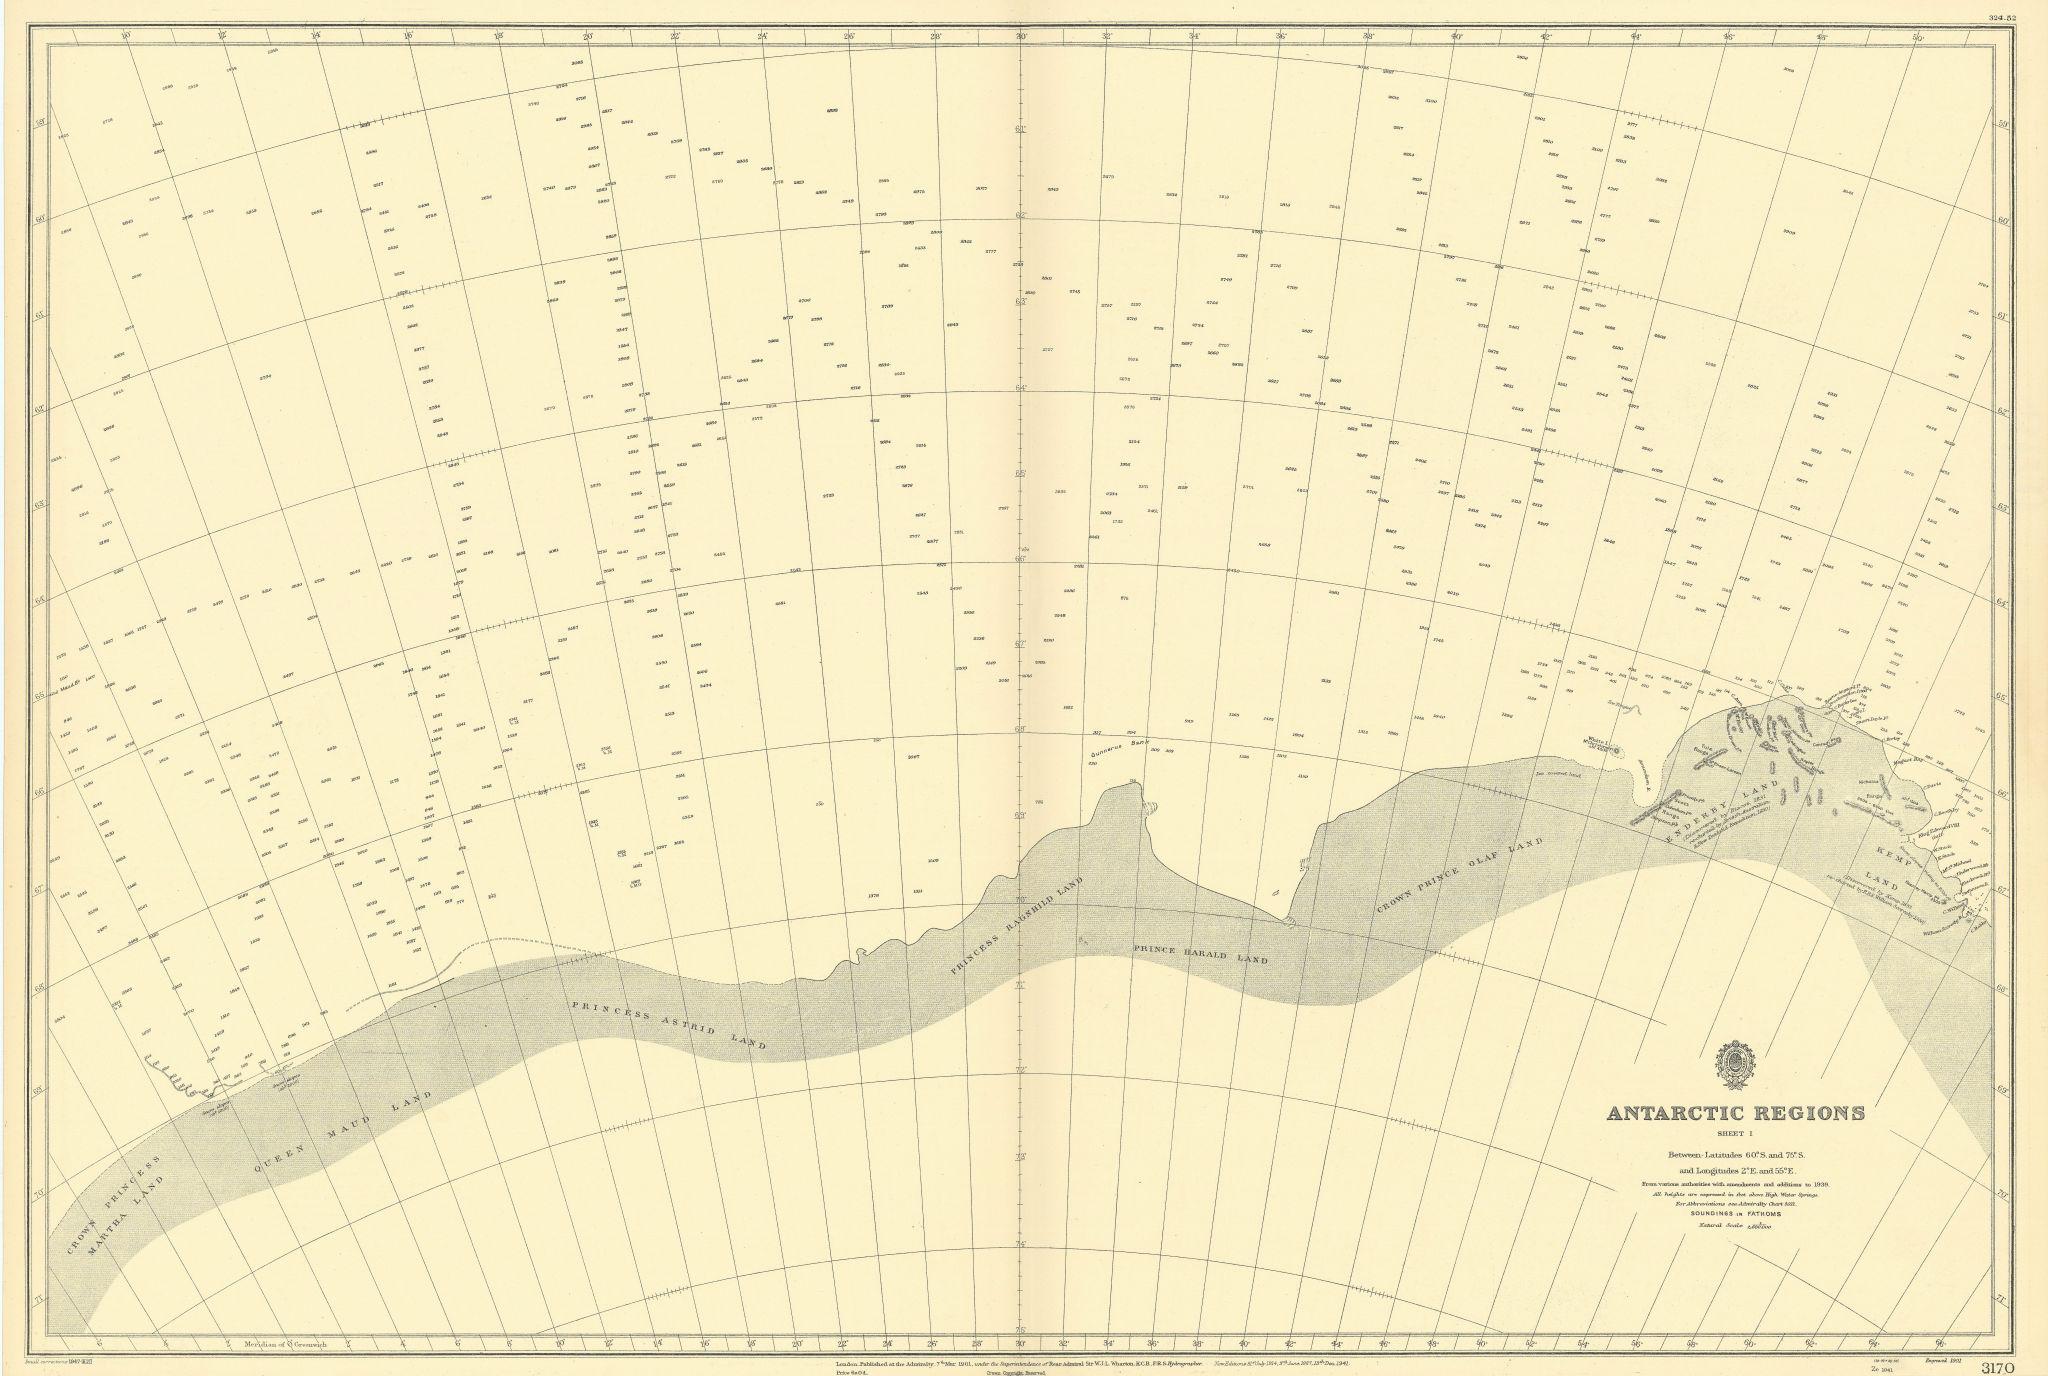 Antarctica 60-75˚S 2-55˚E Enderby Kemp Maud Land ADMIRALTY chart 1901 (1947) map